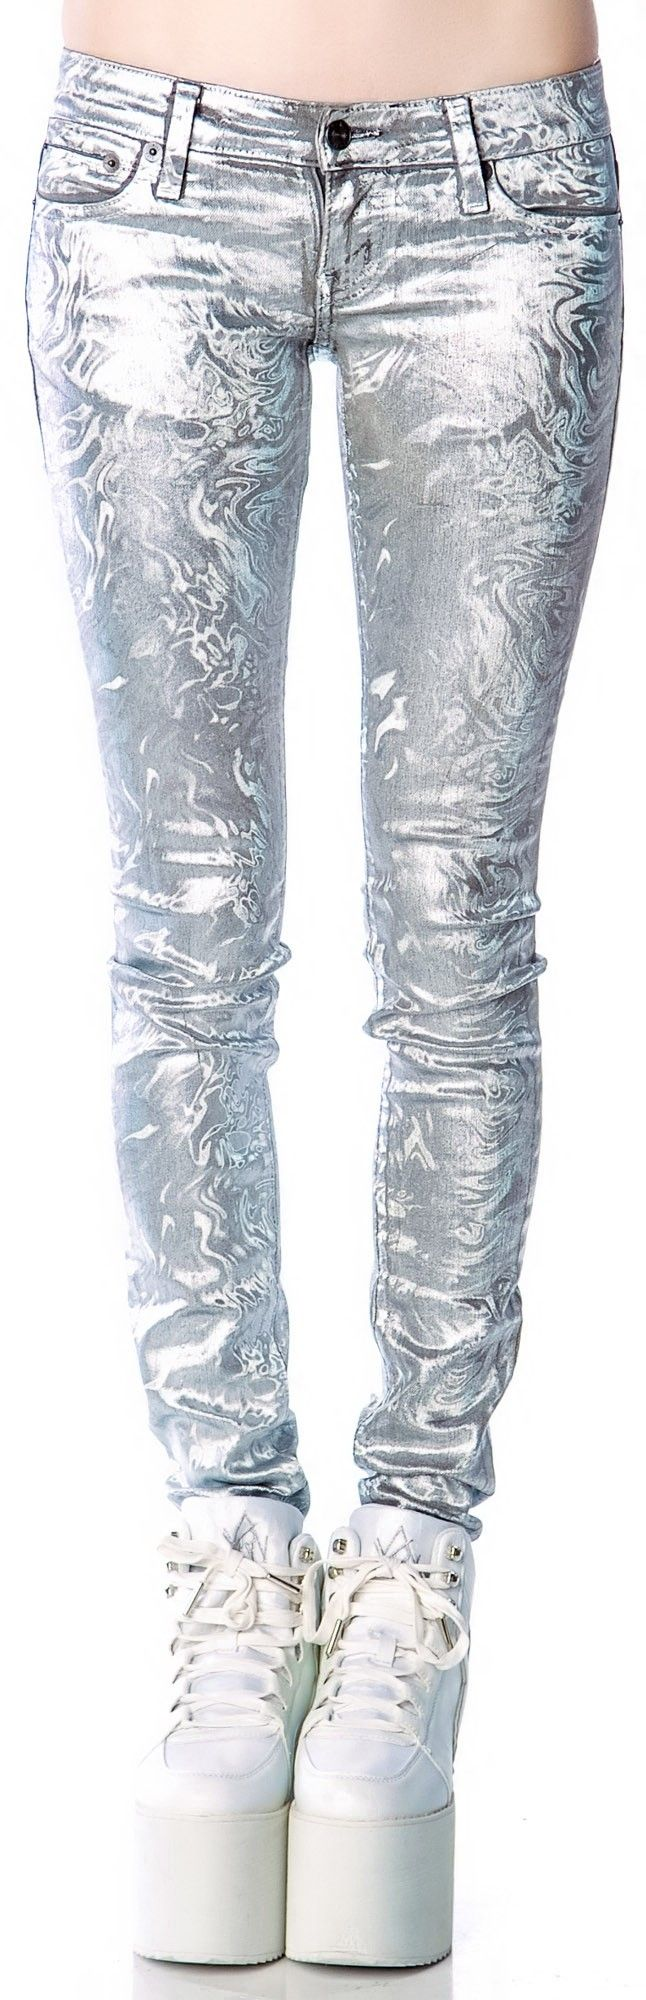 Kill City Melting Holographic Foil Junkie Jeans | Dolls Kill